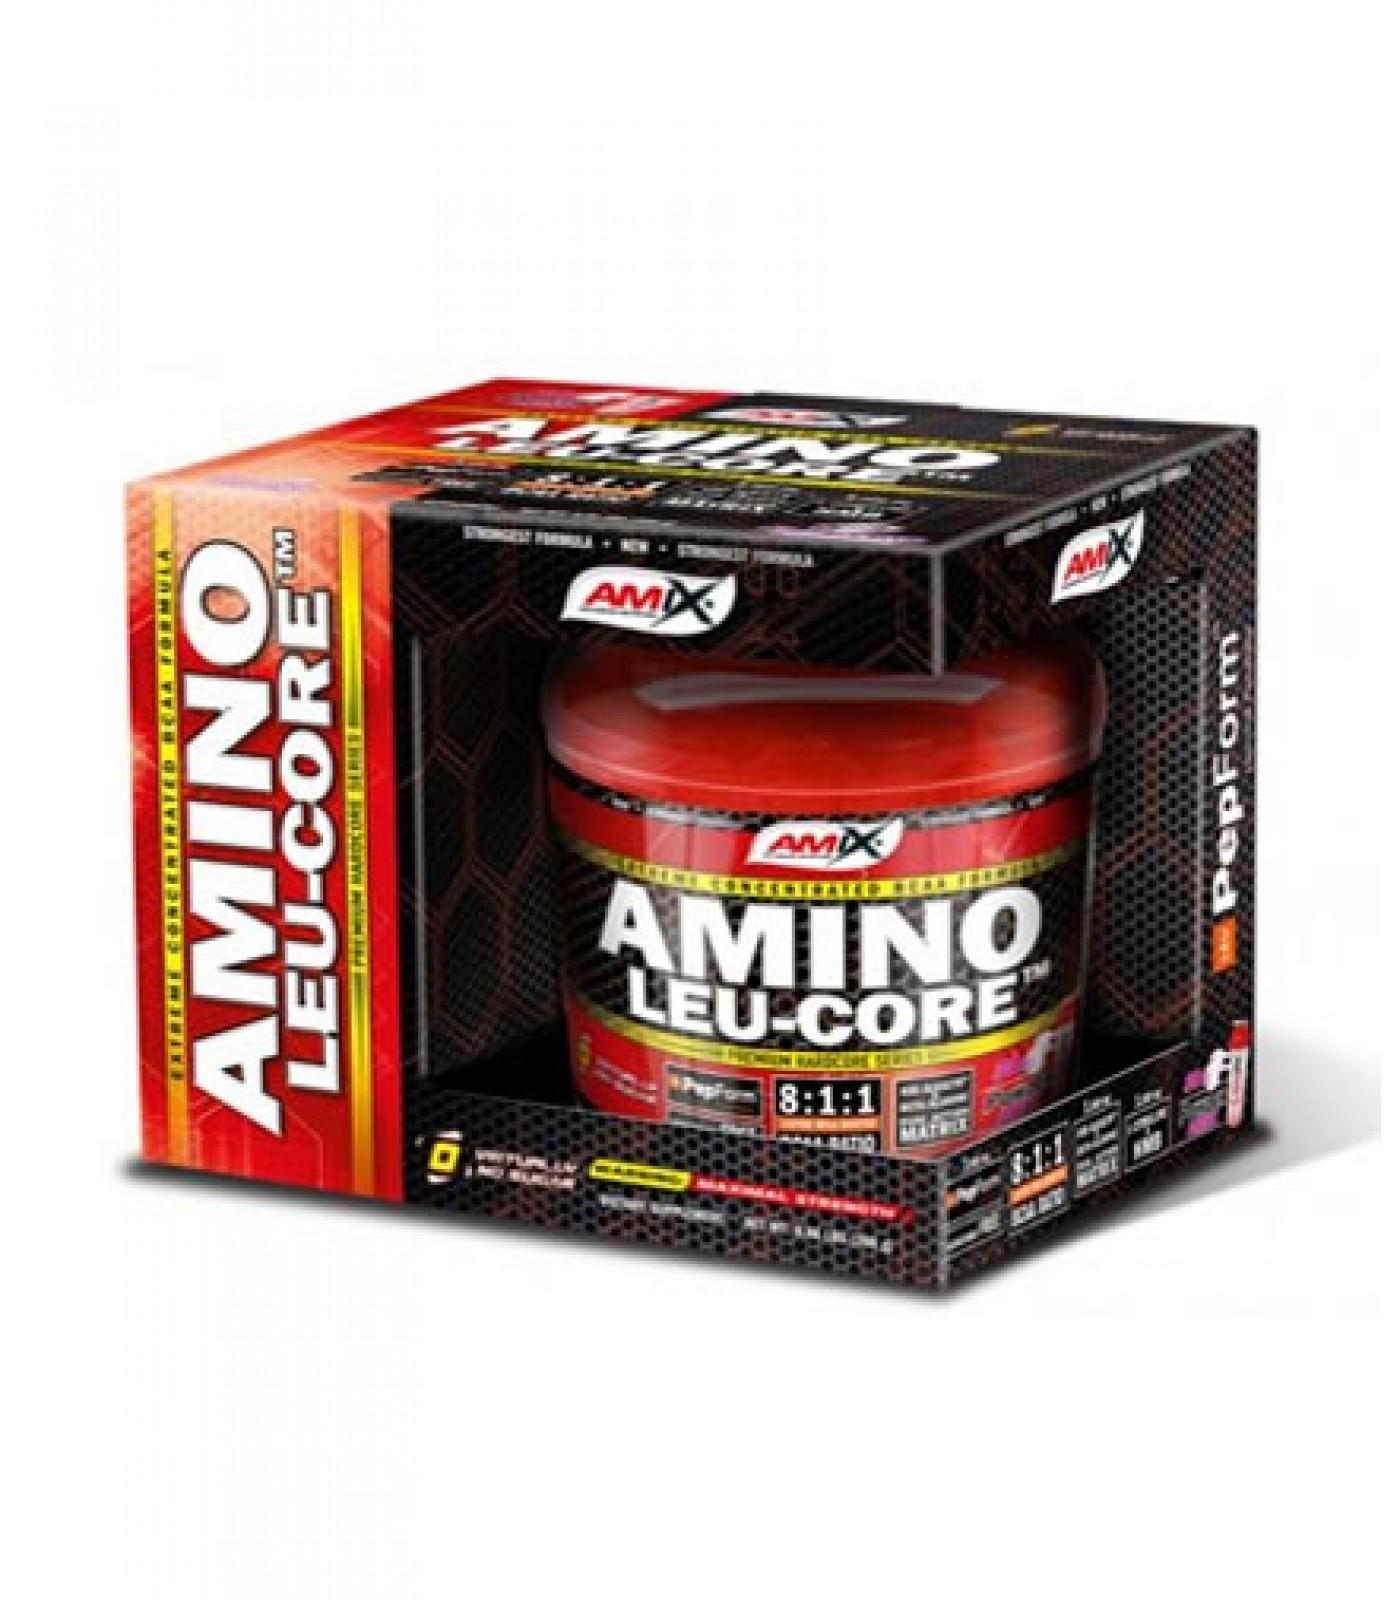 Amix - Amino Leu-Core ™ BCAA 8:1:1 / 390gr.